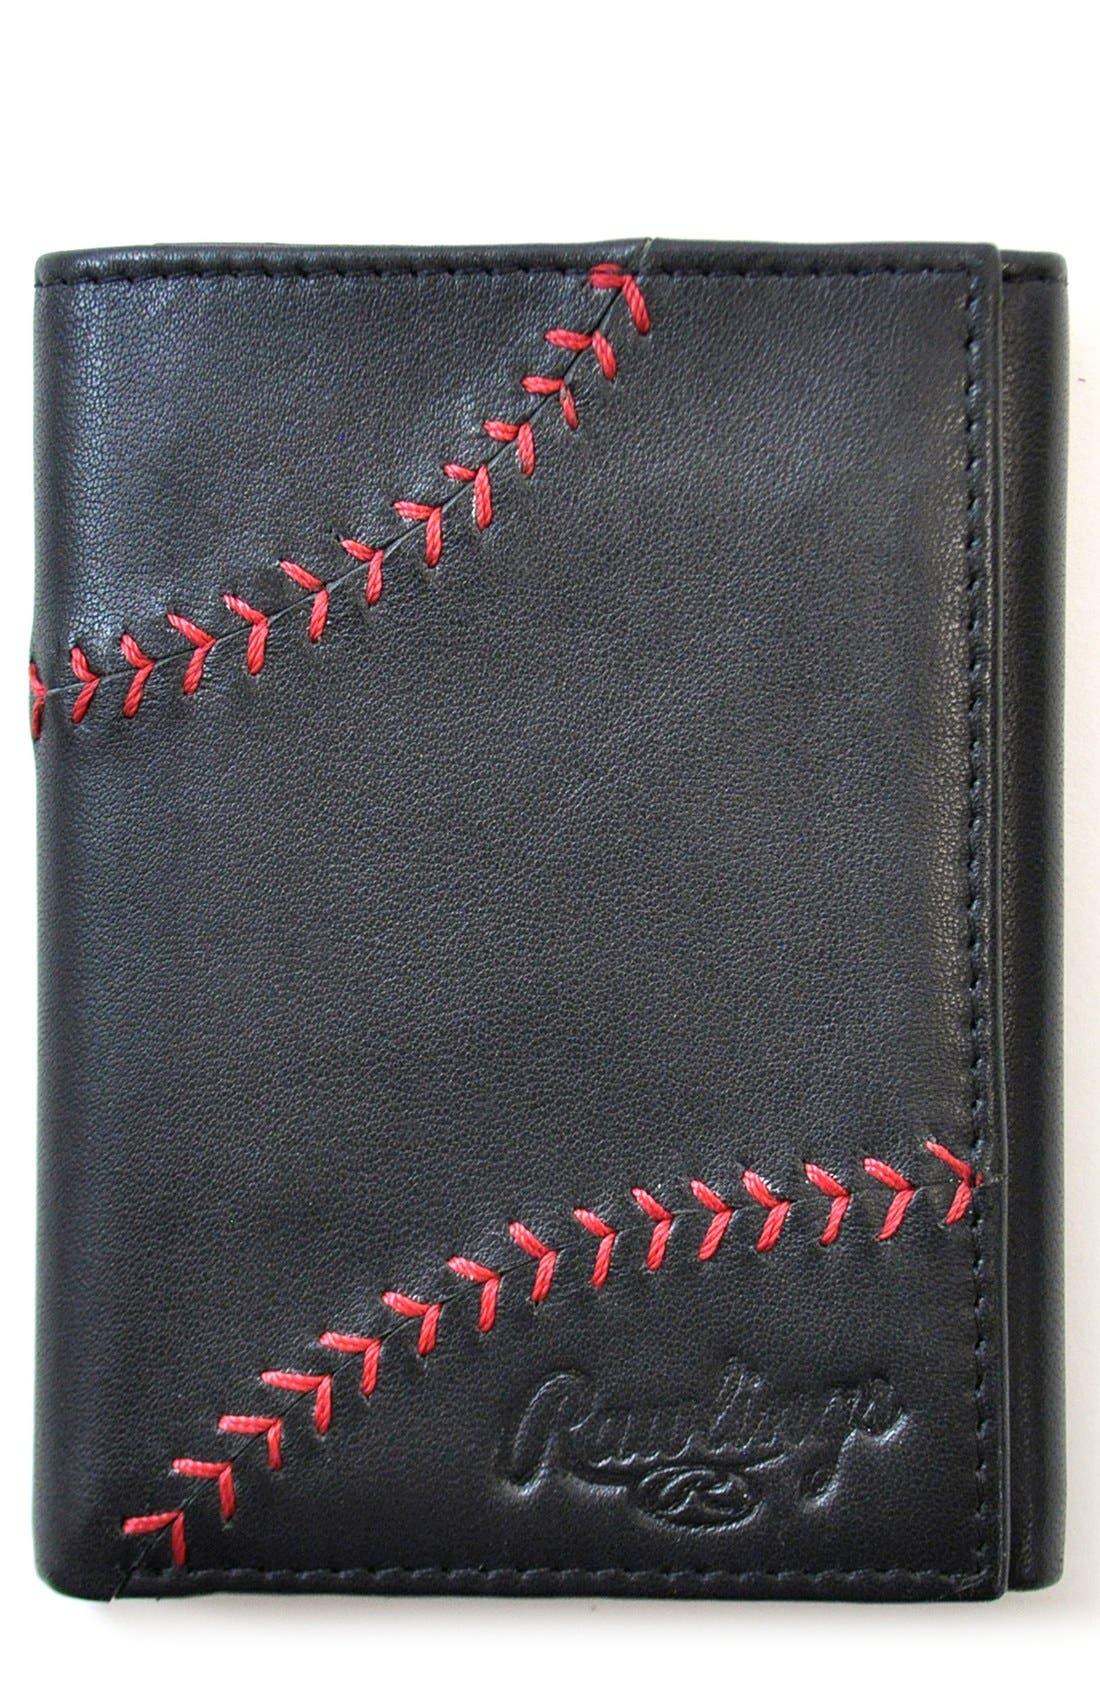 RAWLINGS Baseball Stitch Leather Trifold Wallet